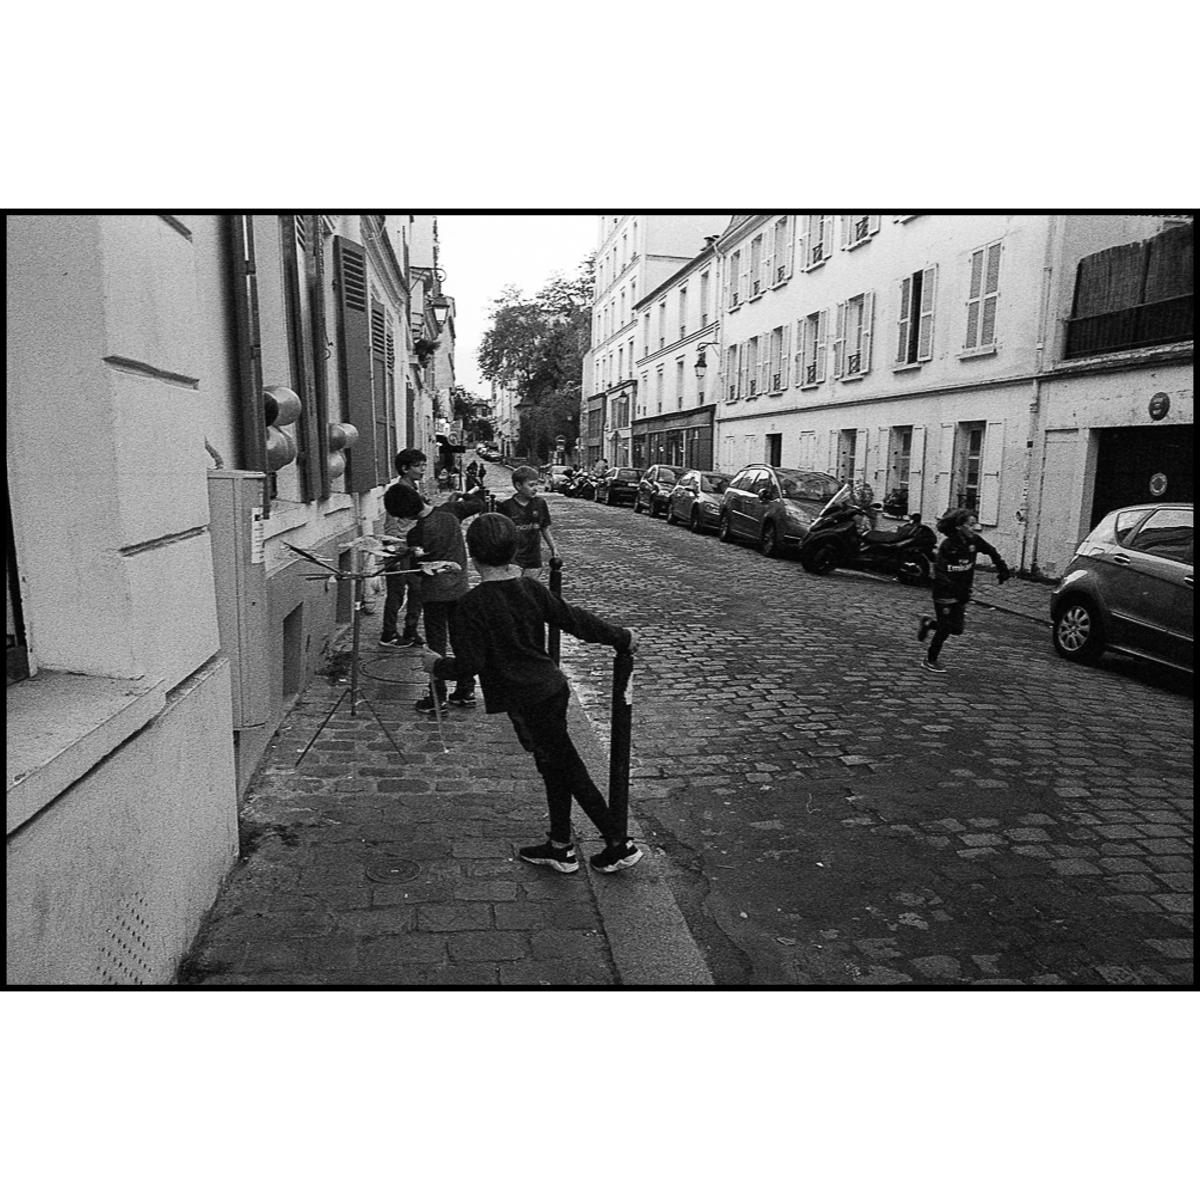 paris file-052.jpg